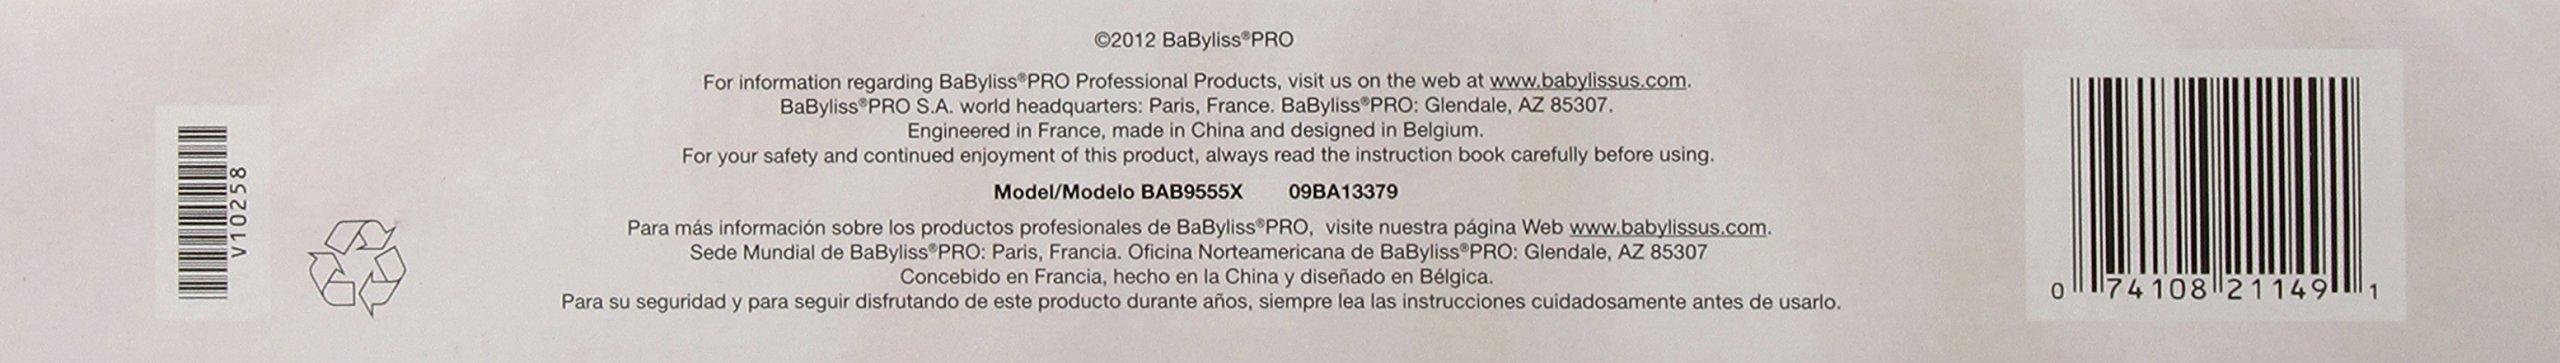 BaBylissPRO Ceramix Extreme Straightening Iron, 1 Inch